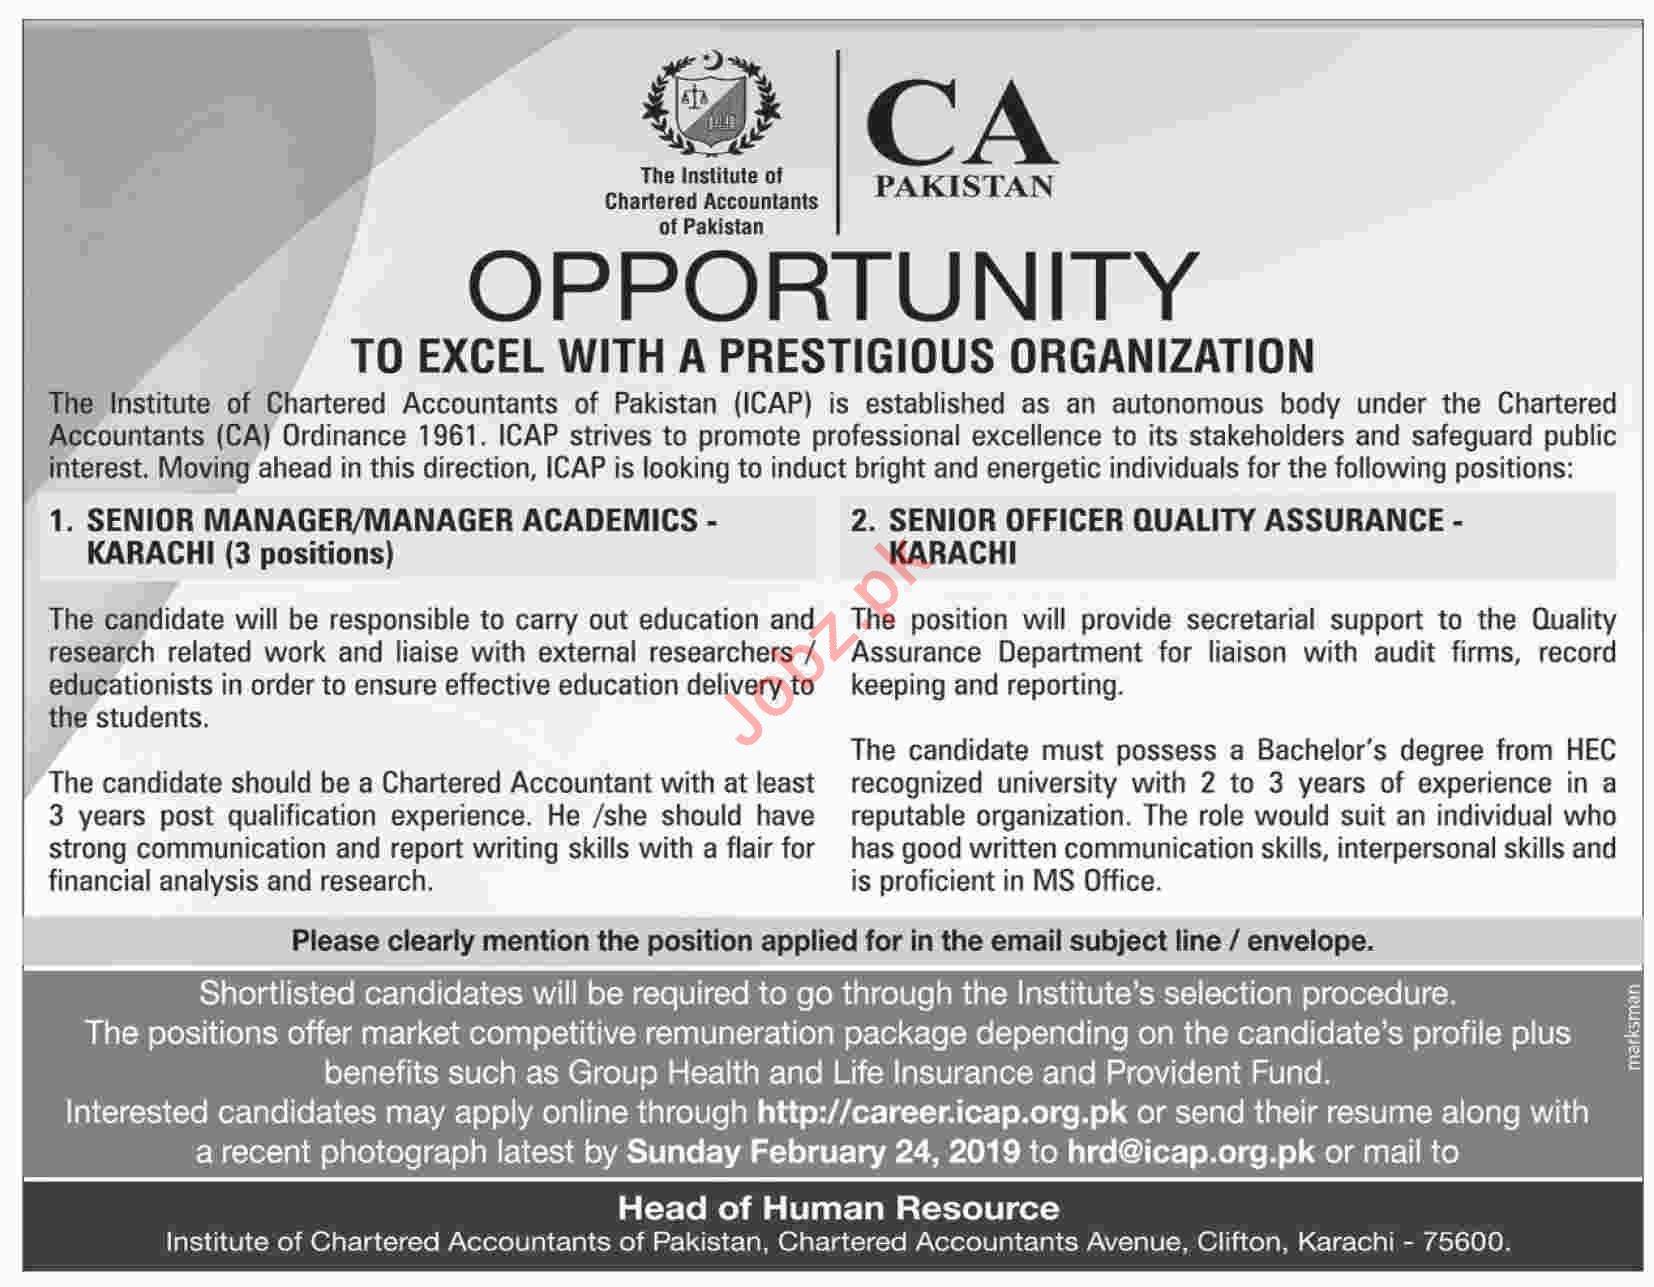 Manager Academic Jobs at CA Pakistan